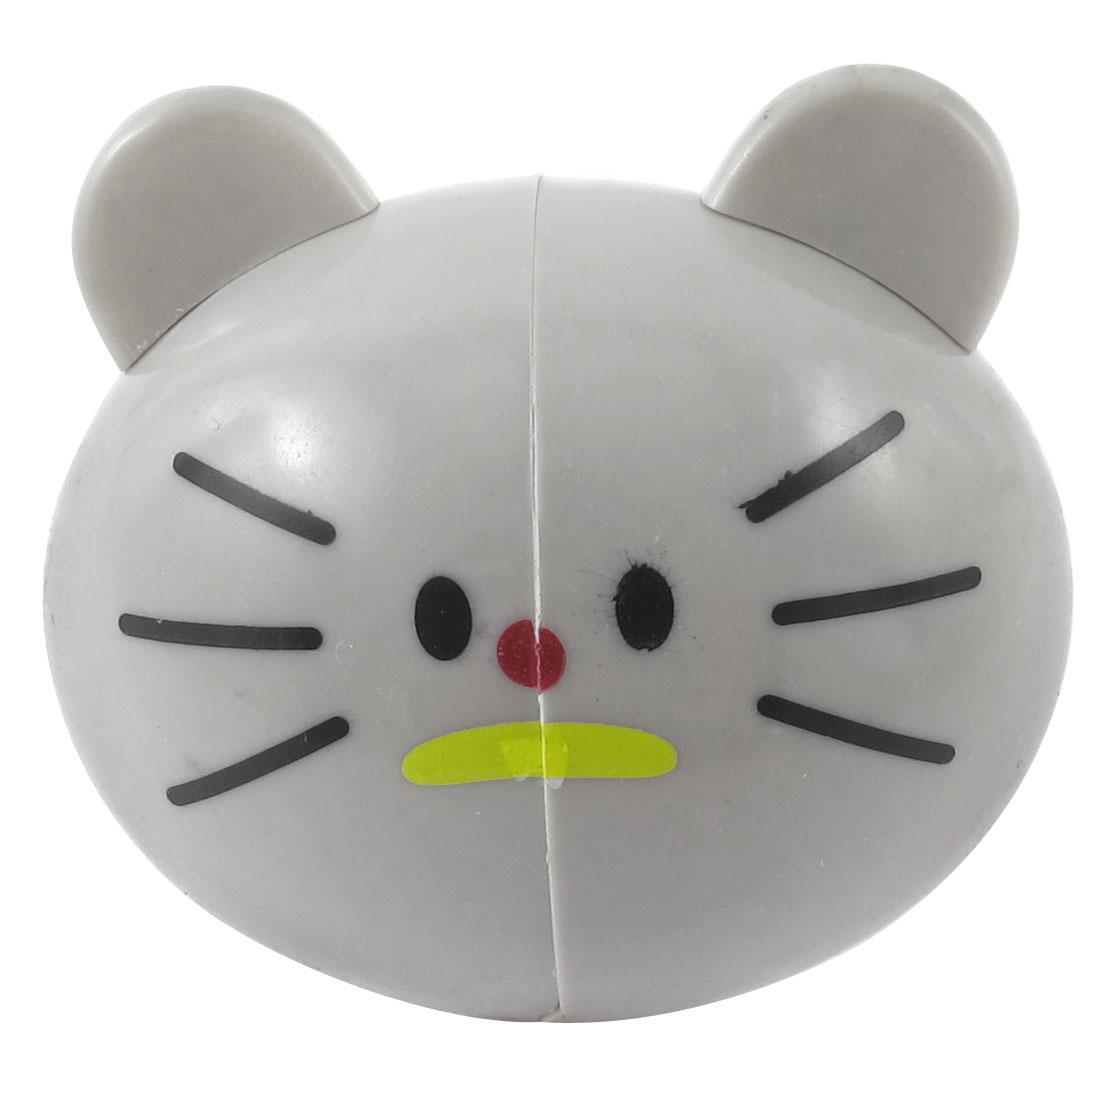 Bathroom Wall Rack Gray Cartoon Cat Head Toothbrush Holder Mount w Suction Grip